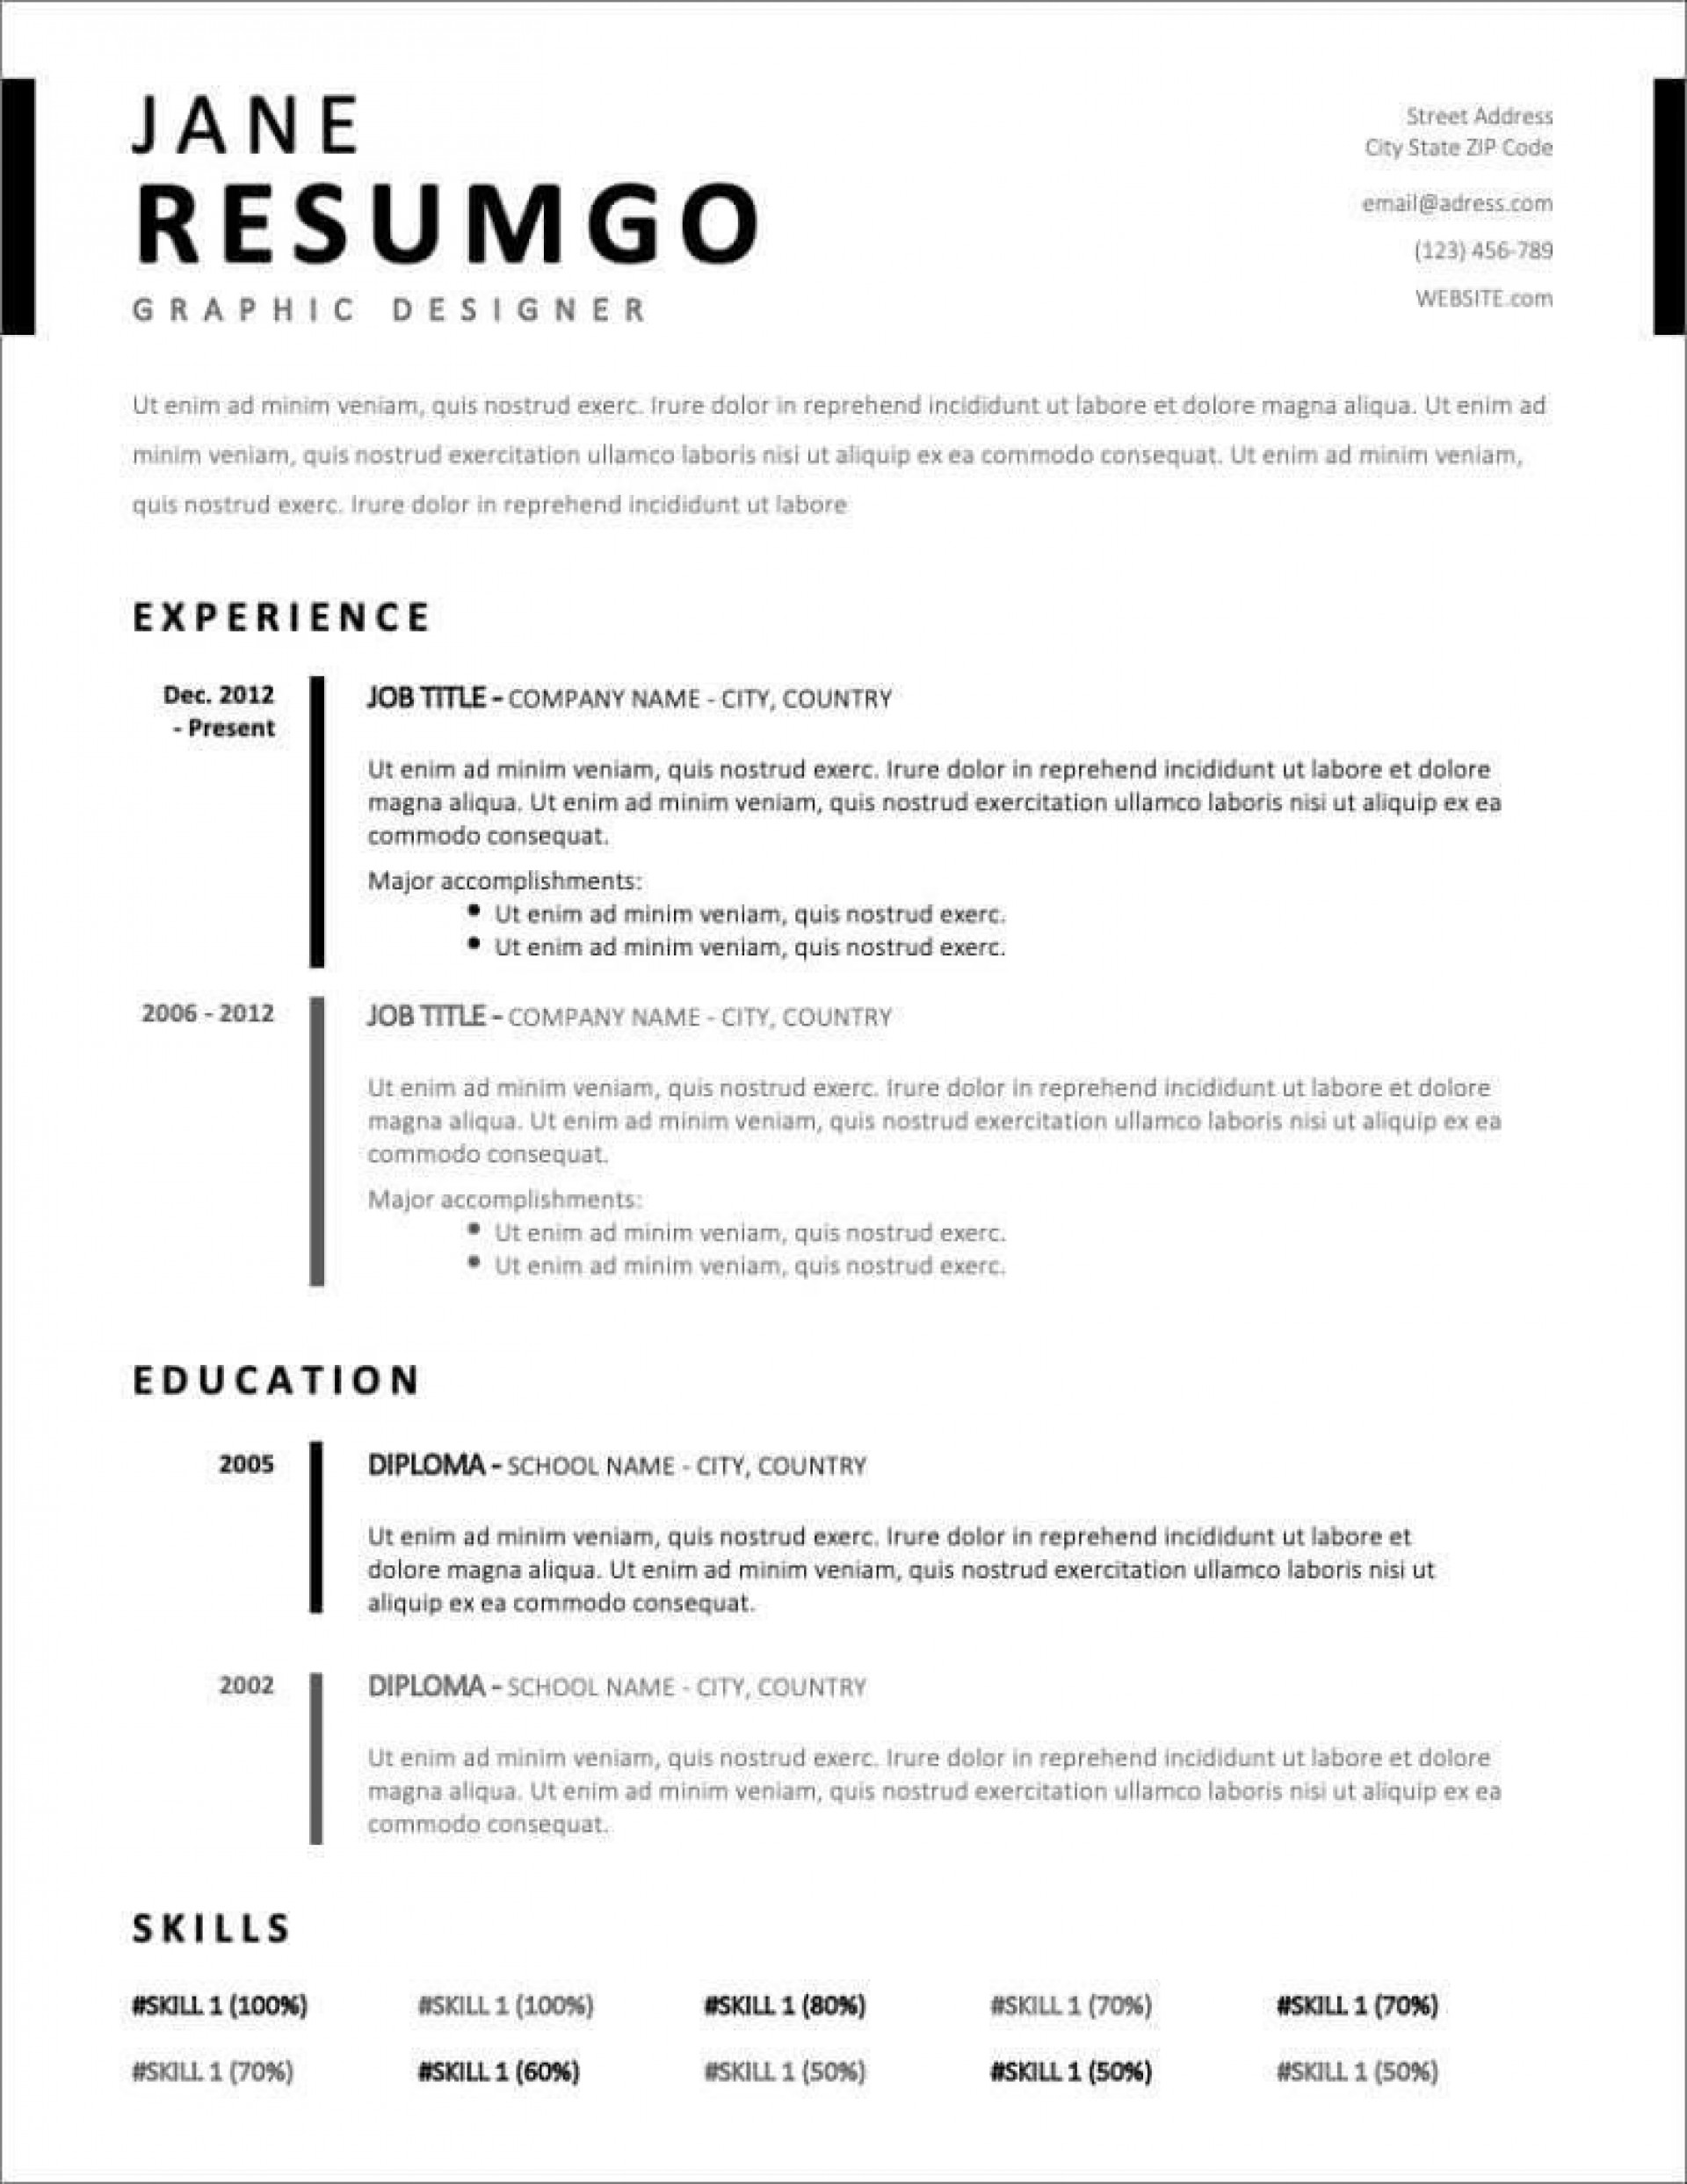 006 Best Basic Resume Template Free Idea  Easy Download Word Australia Doc1920